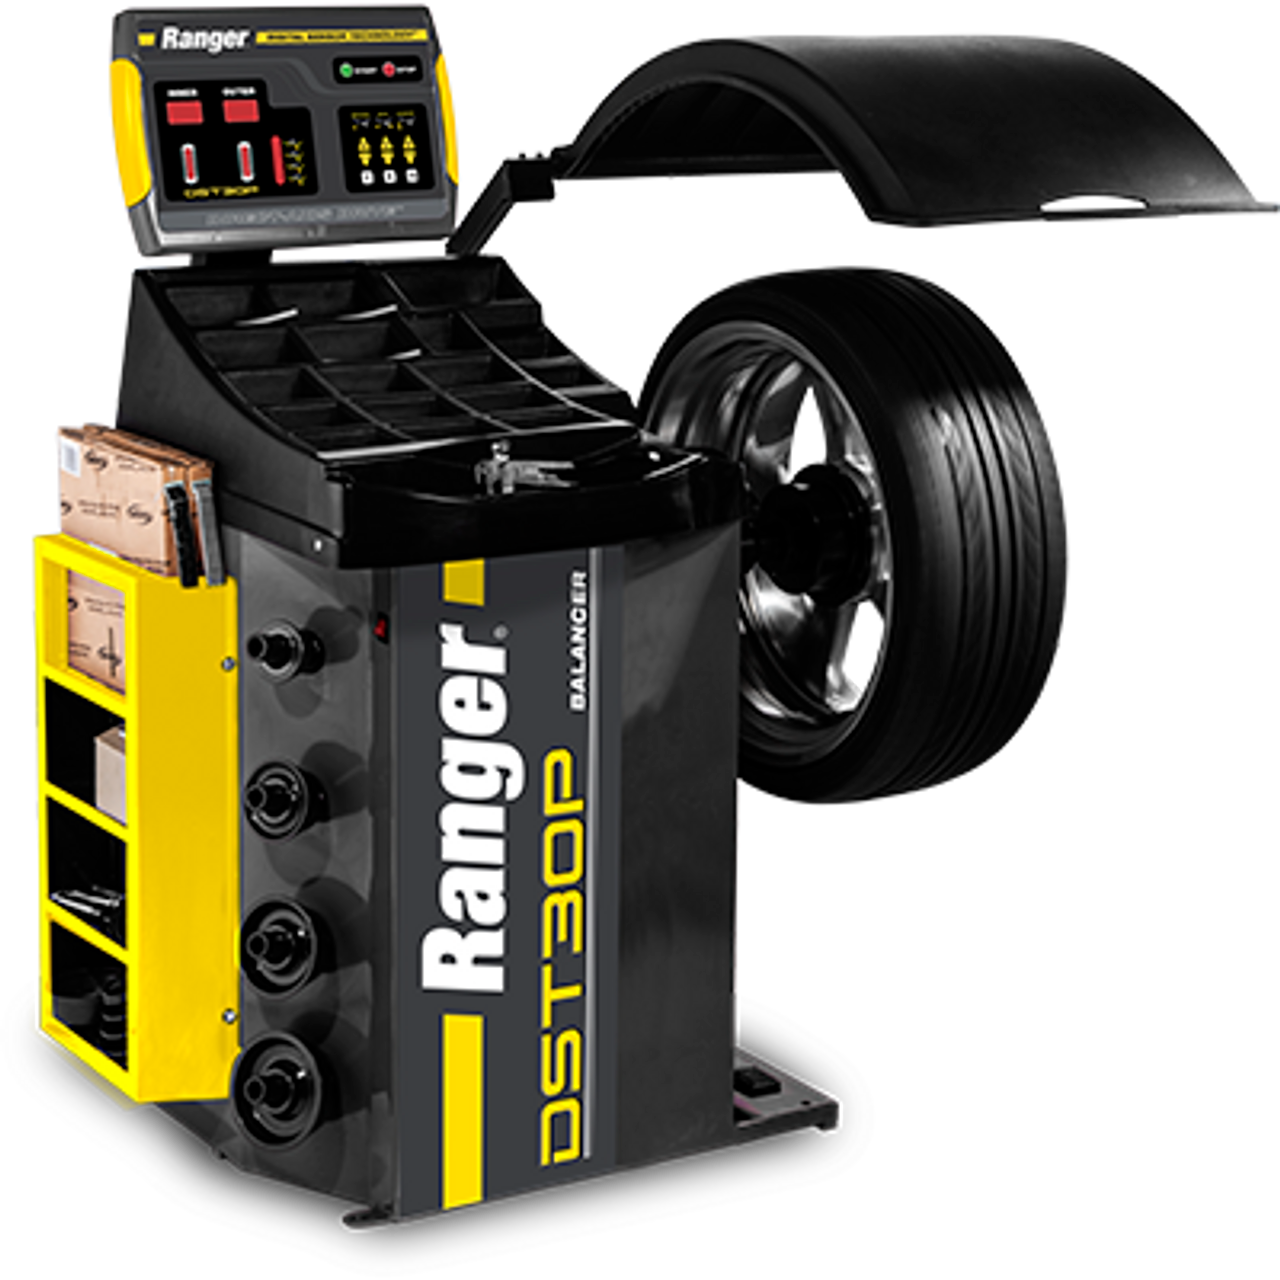 dst30p-wheel-balancer-5140300-ranger-products (1)